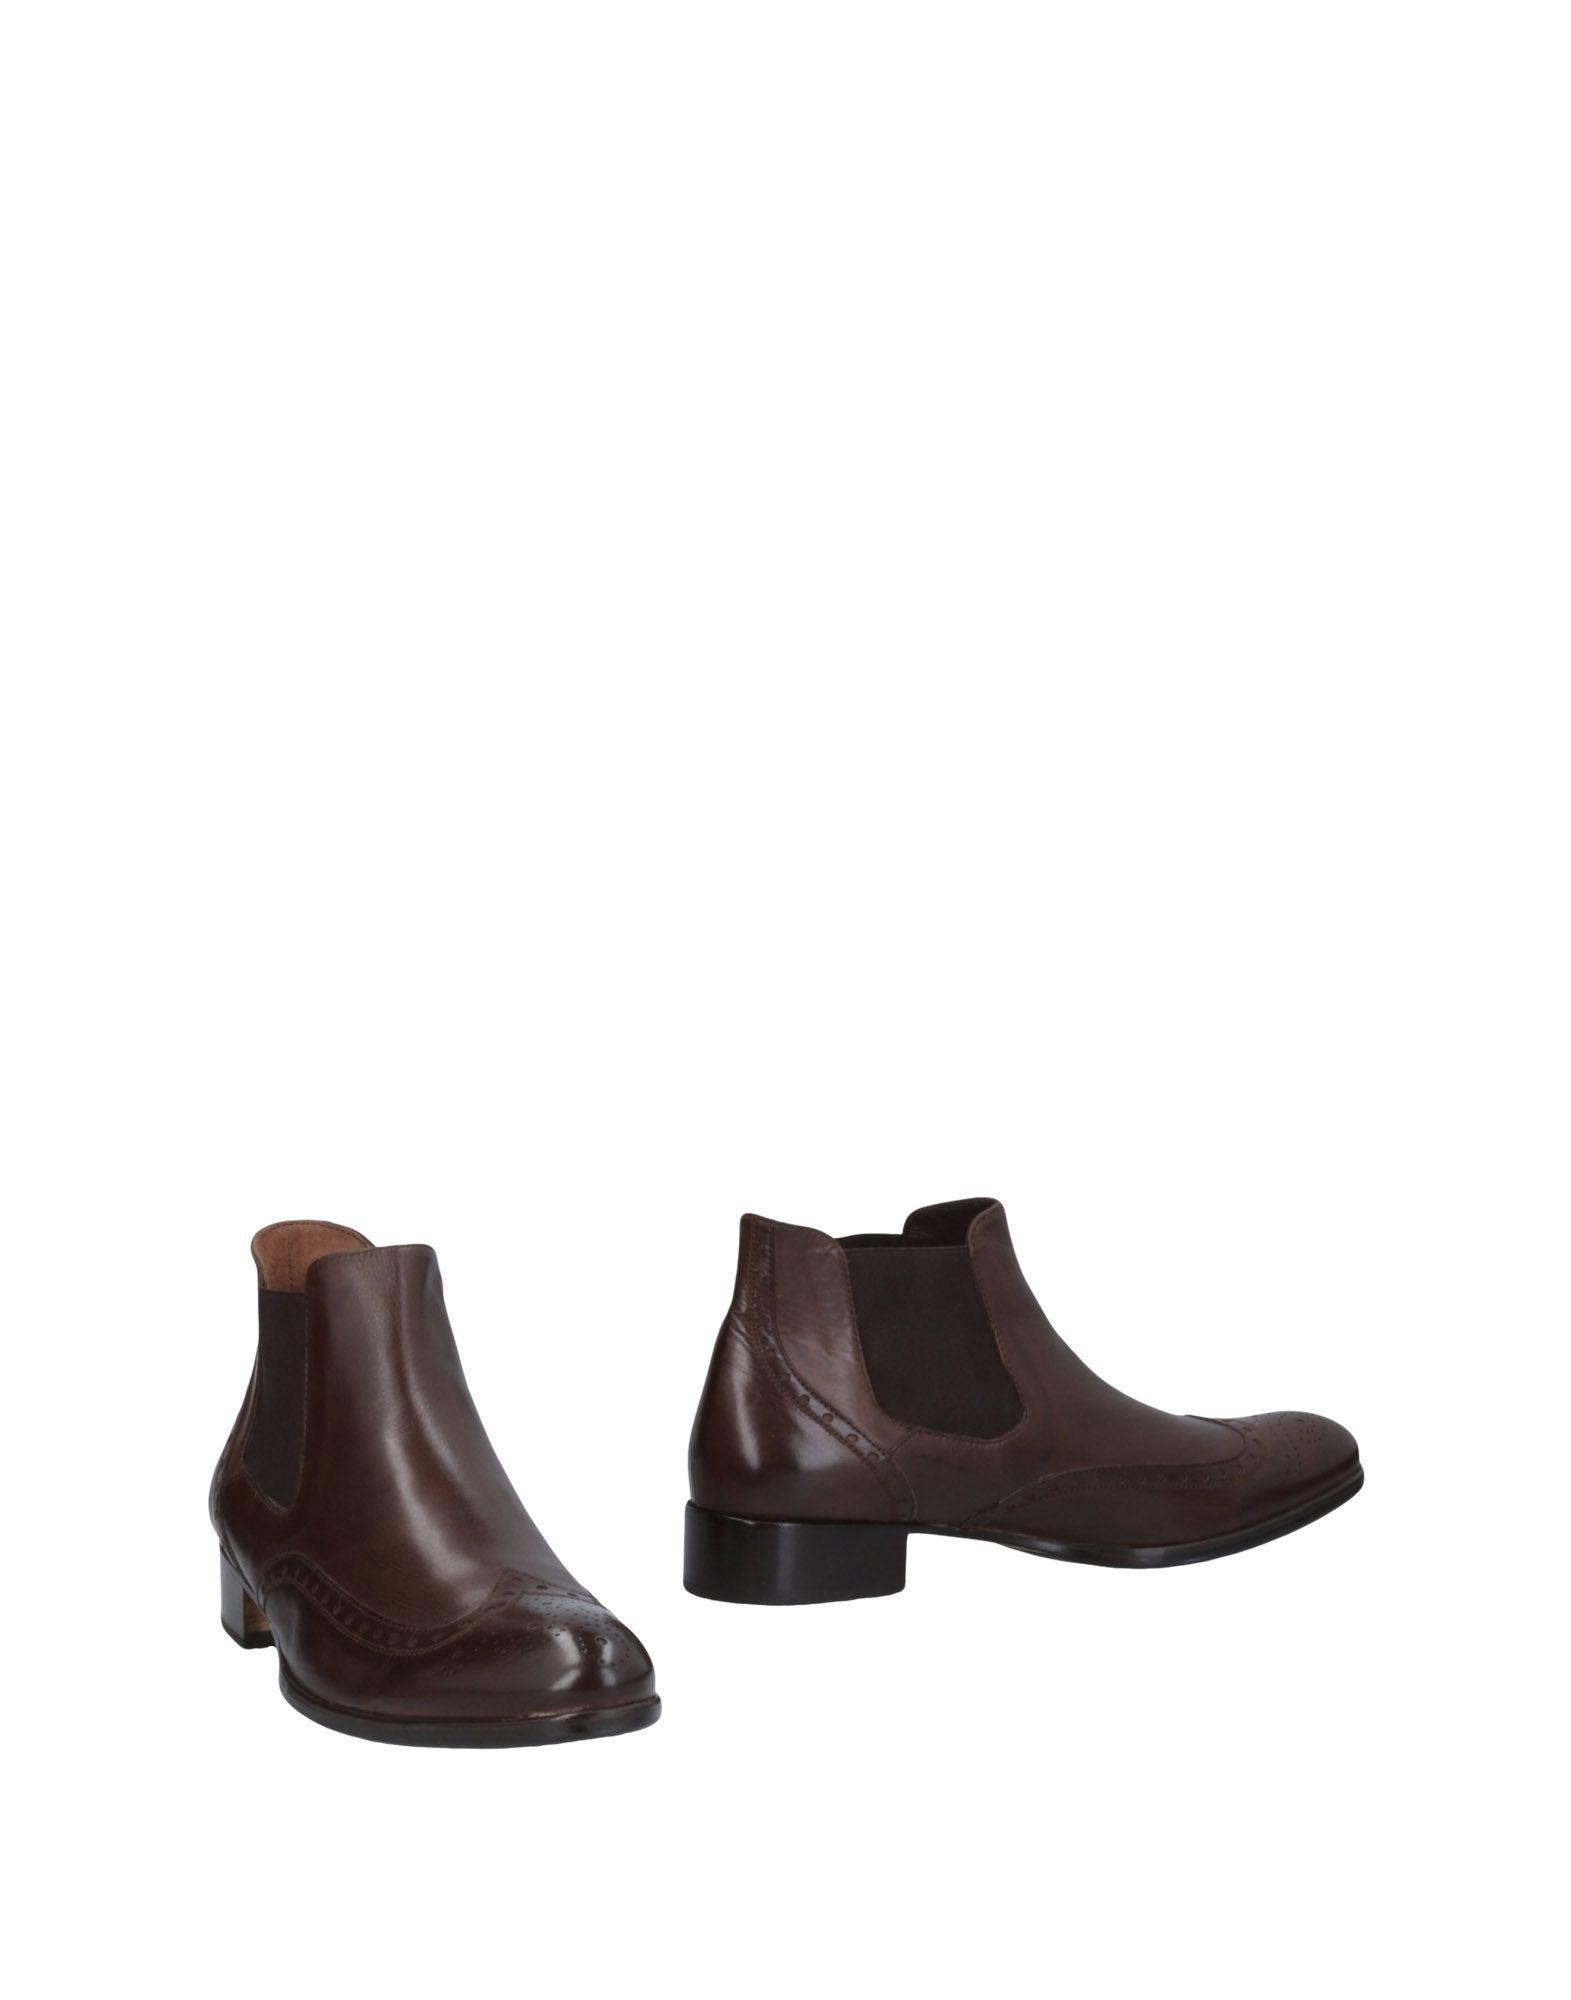 Stilvolle billige Stiefel Schuhe Calpierre Chelsea Stiefel billige Damen  11077526BW f12b45